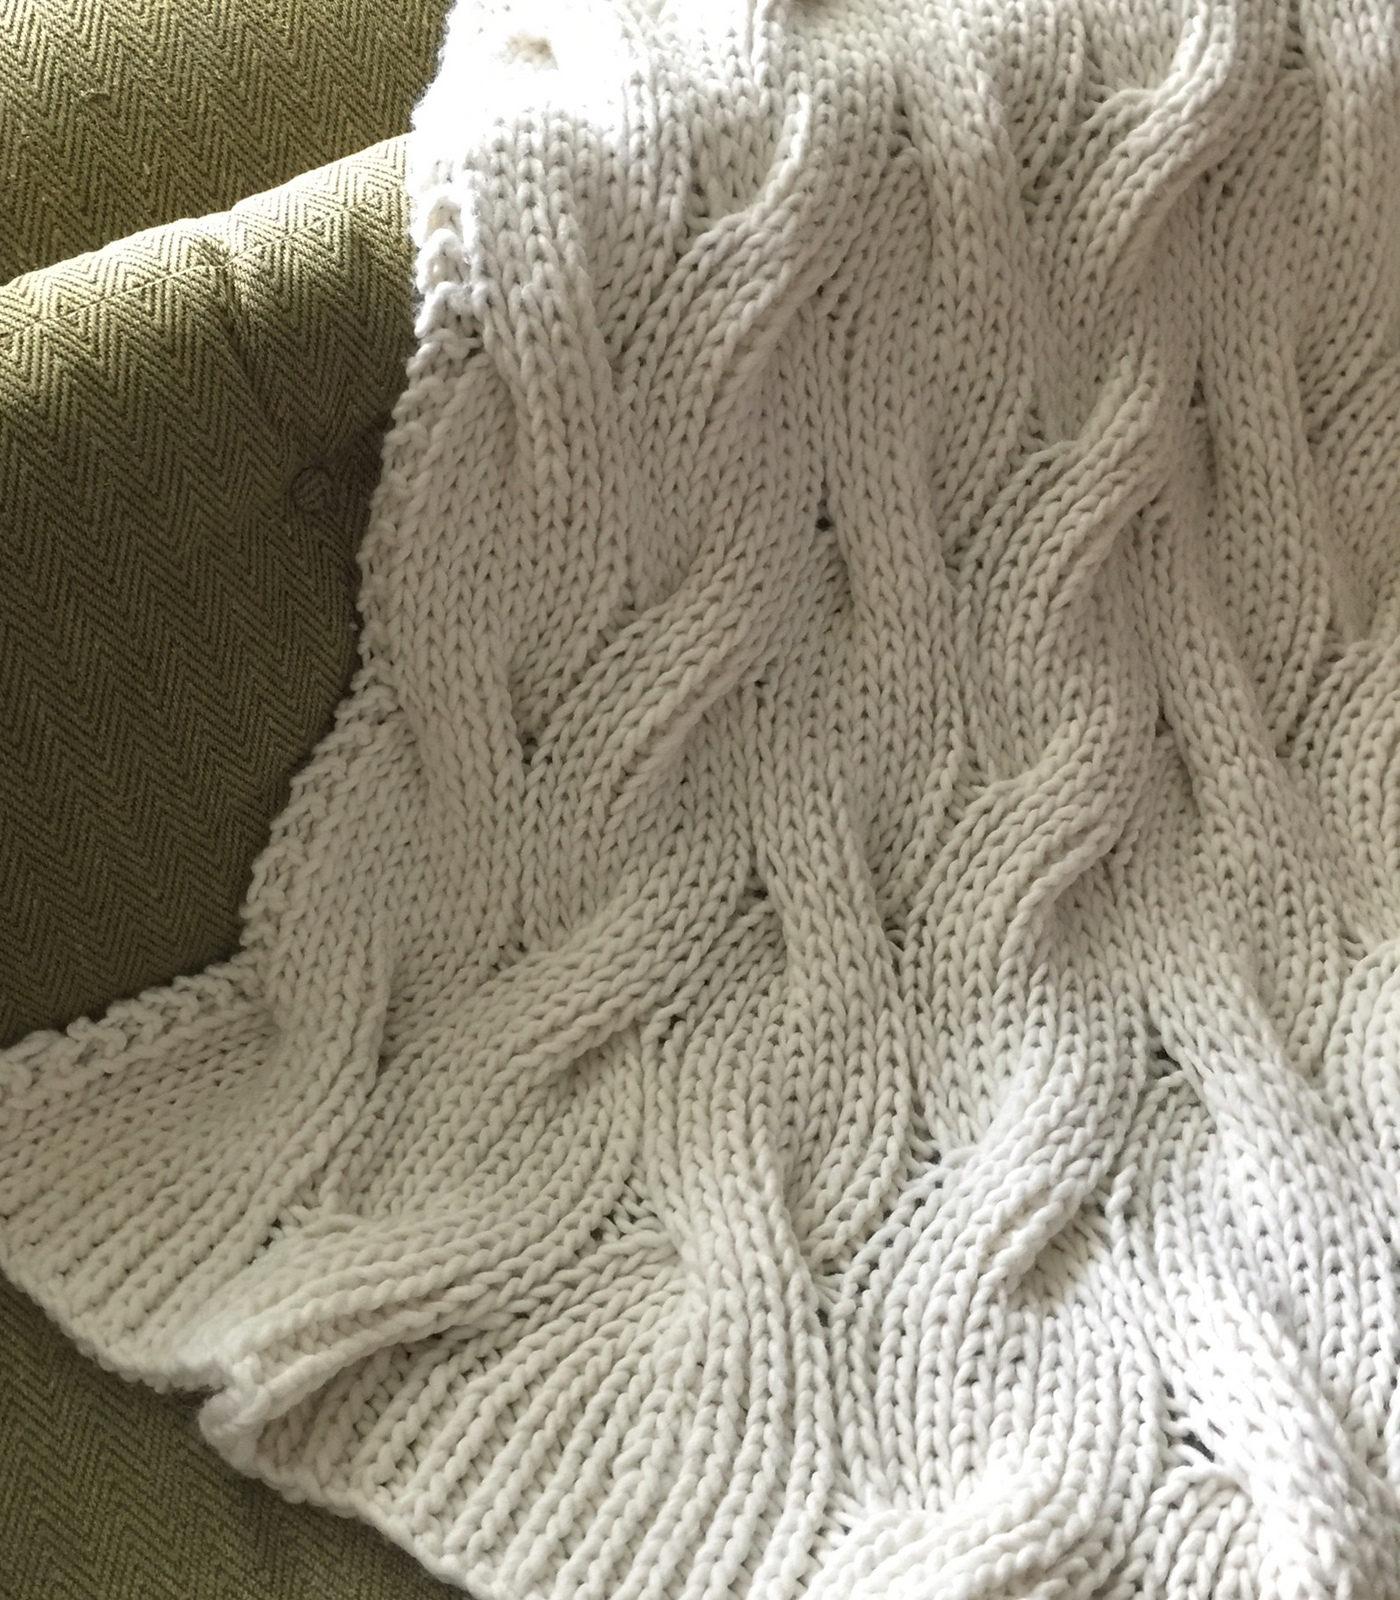 Reversible Blanket Knitting Patterns In The Loop Knitting